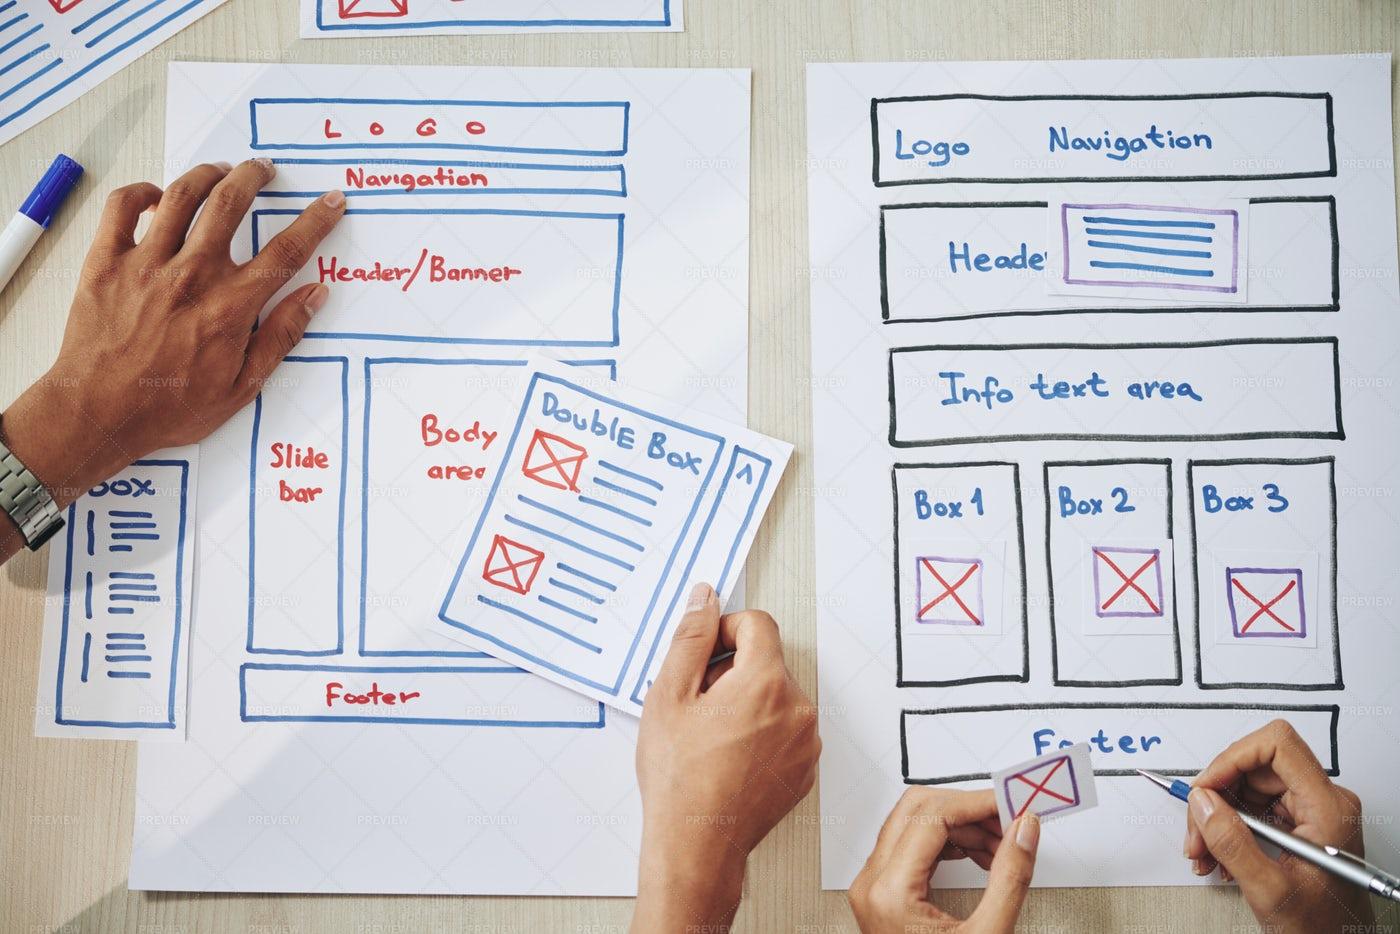 Crop Colleagues Creating Website...: Stock Photos